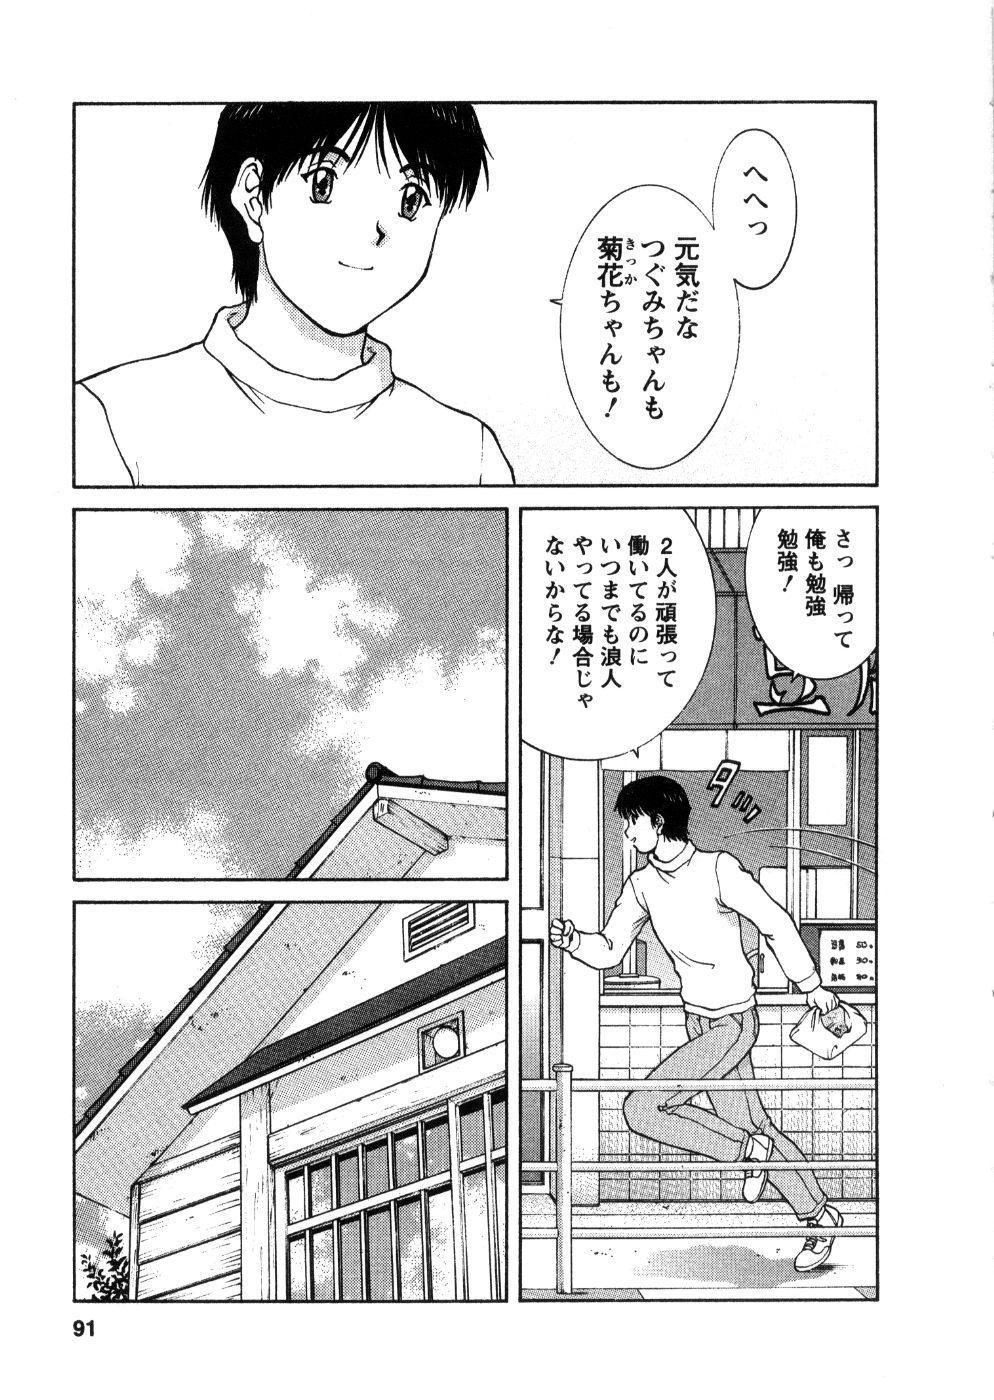 Oneechan-tachi ga Yatte Kuru 03 92